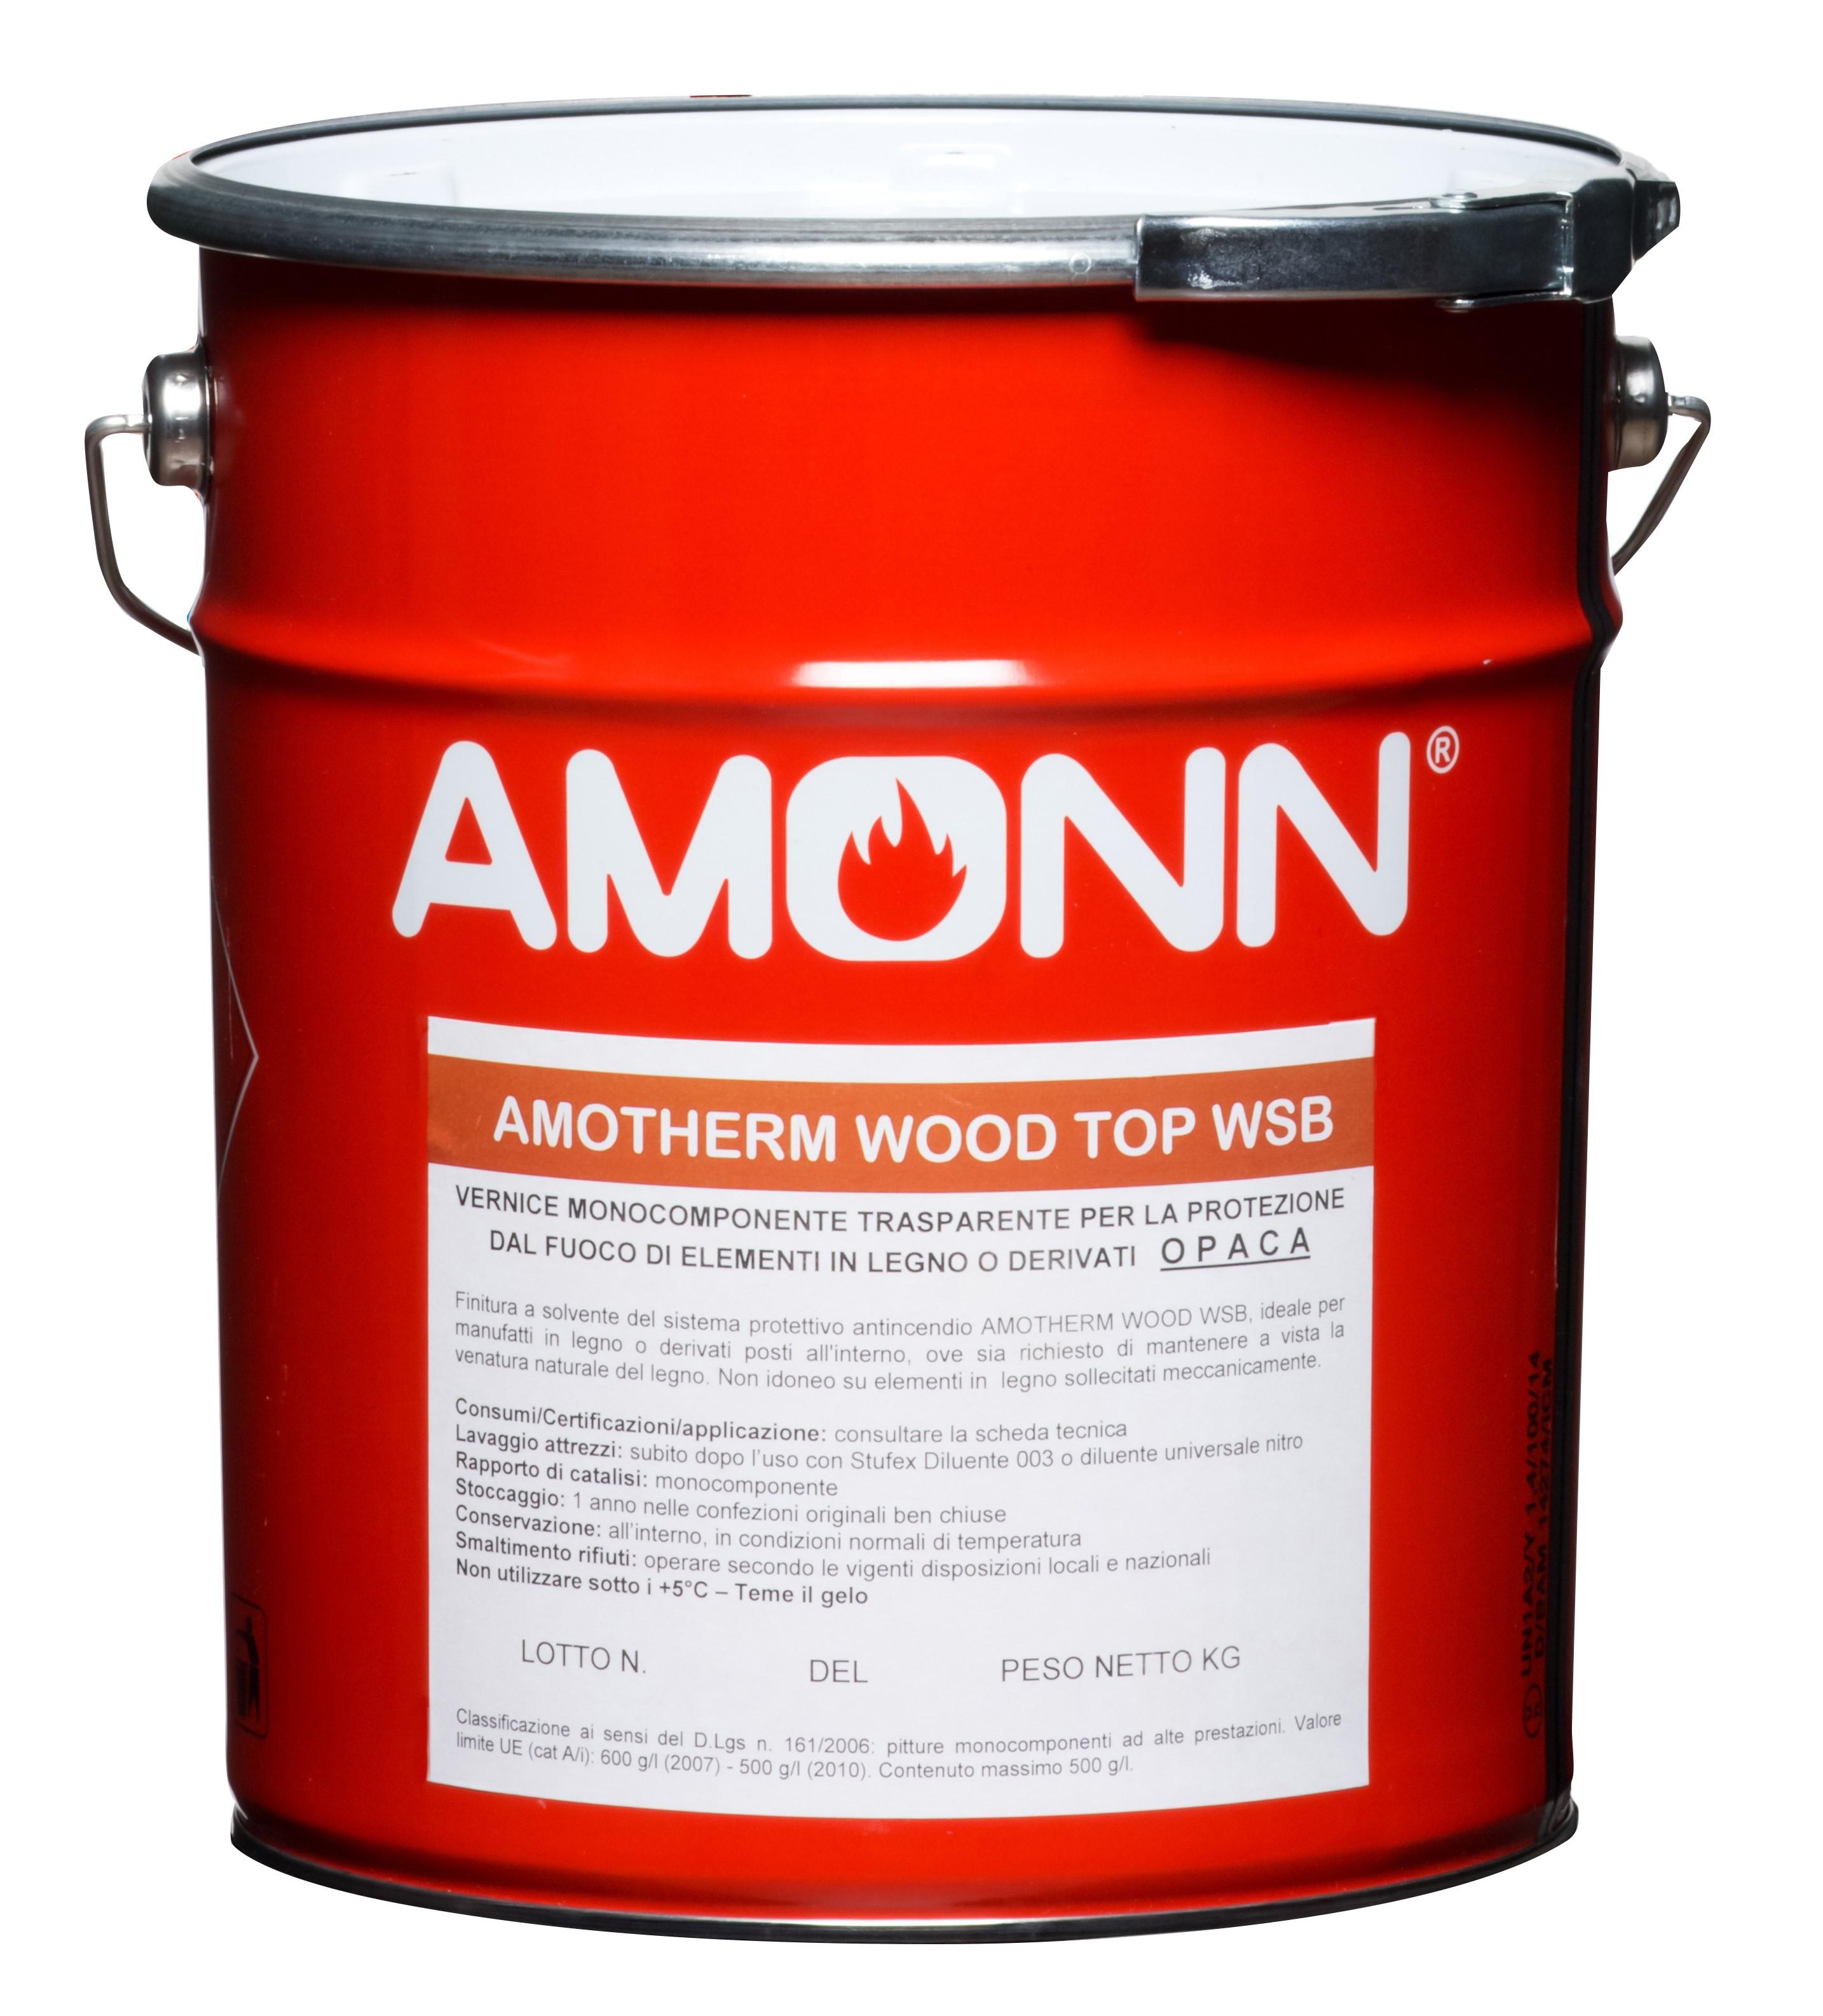 Amonn Amotherm Wood Top WSB ochranný náter Transparentná,5kg